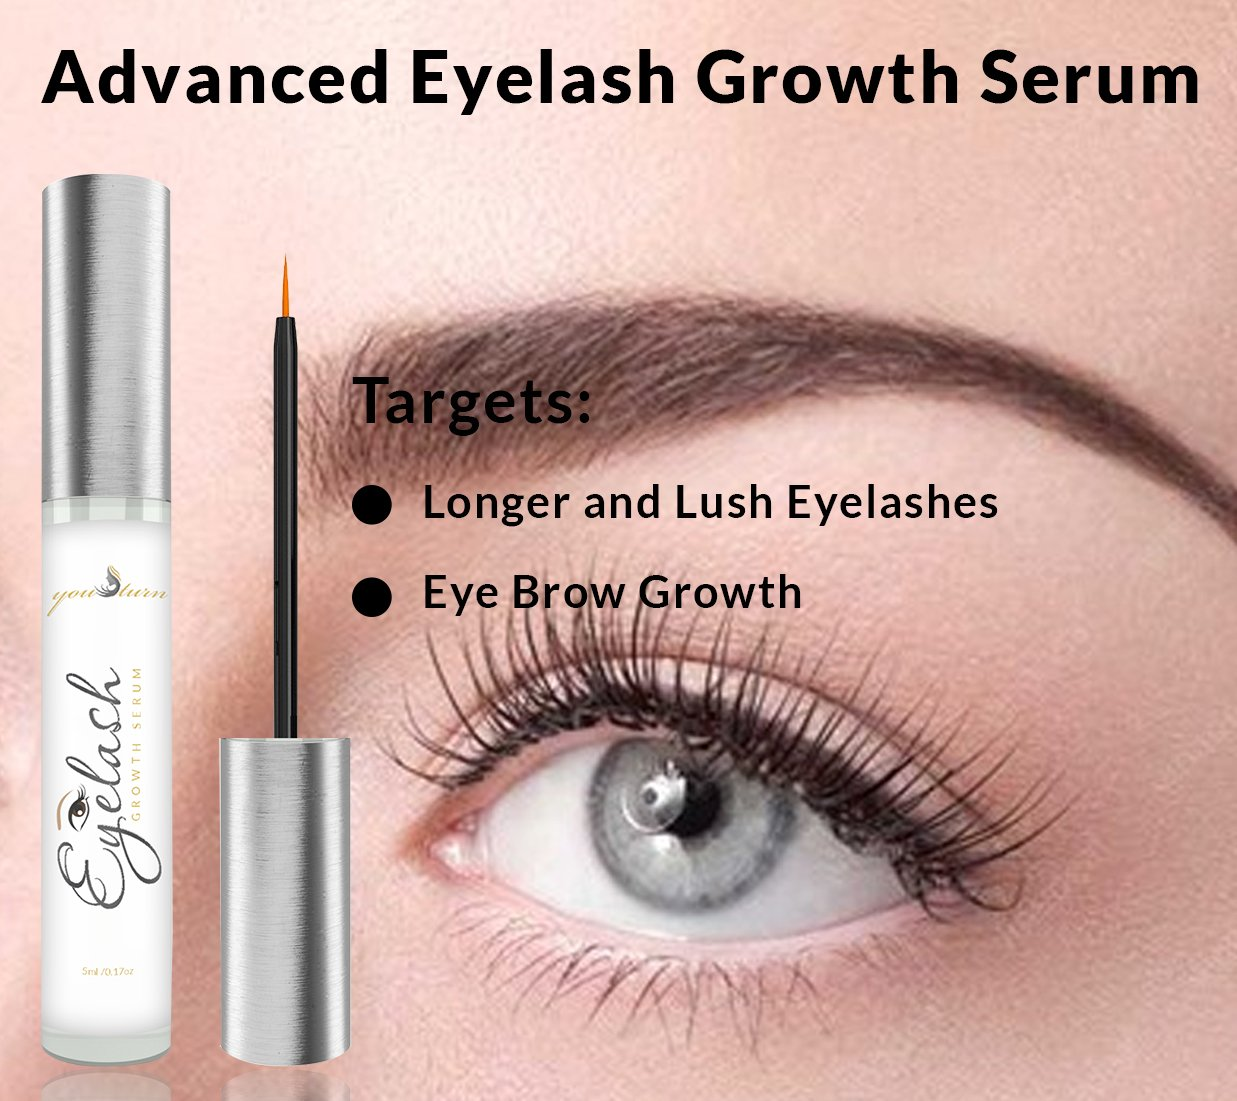 67ce1e0a1da Amazon.com: Lash Growth Serum - Best Eyelash Growth Serum For Fuller &  Thicker Lashes & Brows - Supports Eyelash Growth, Eyebrow Growth, Thinning  Lashes, ...